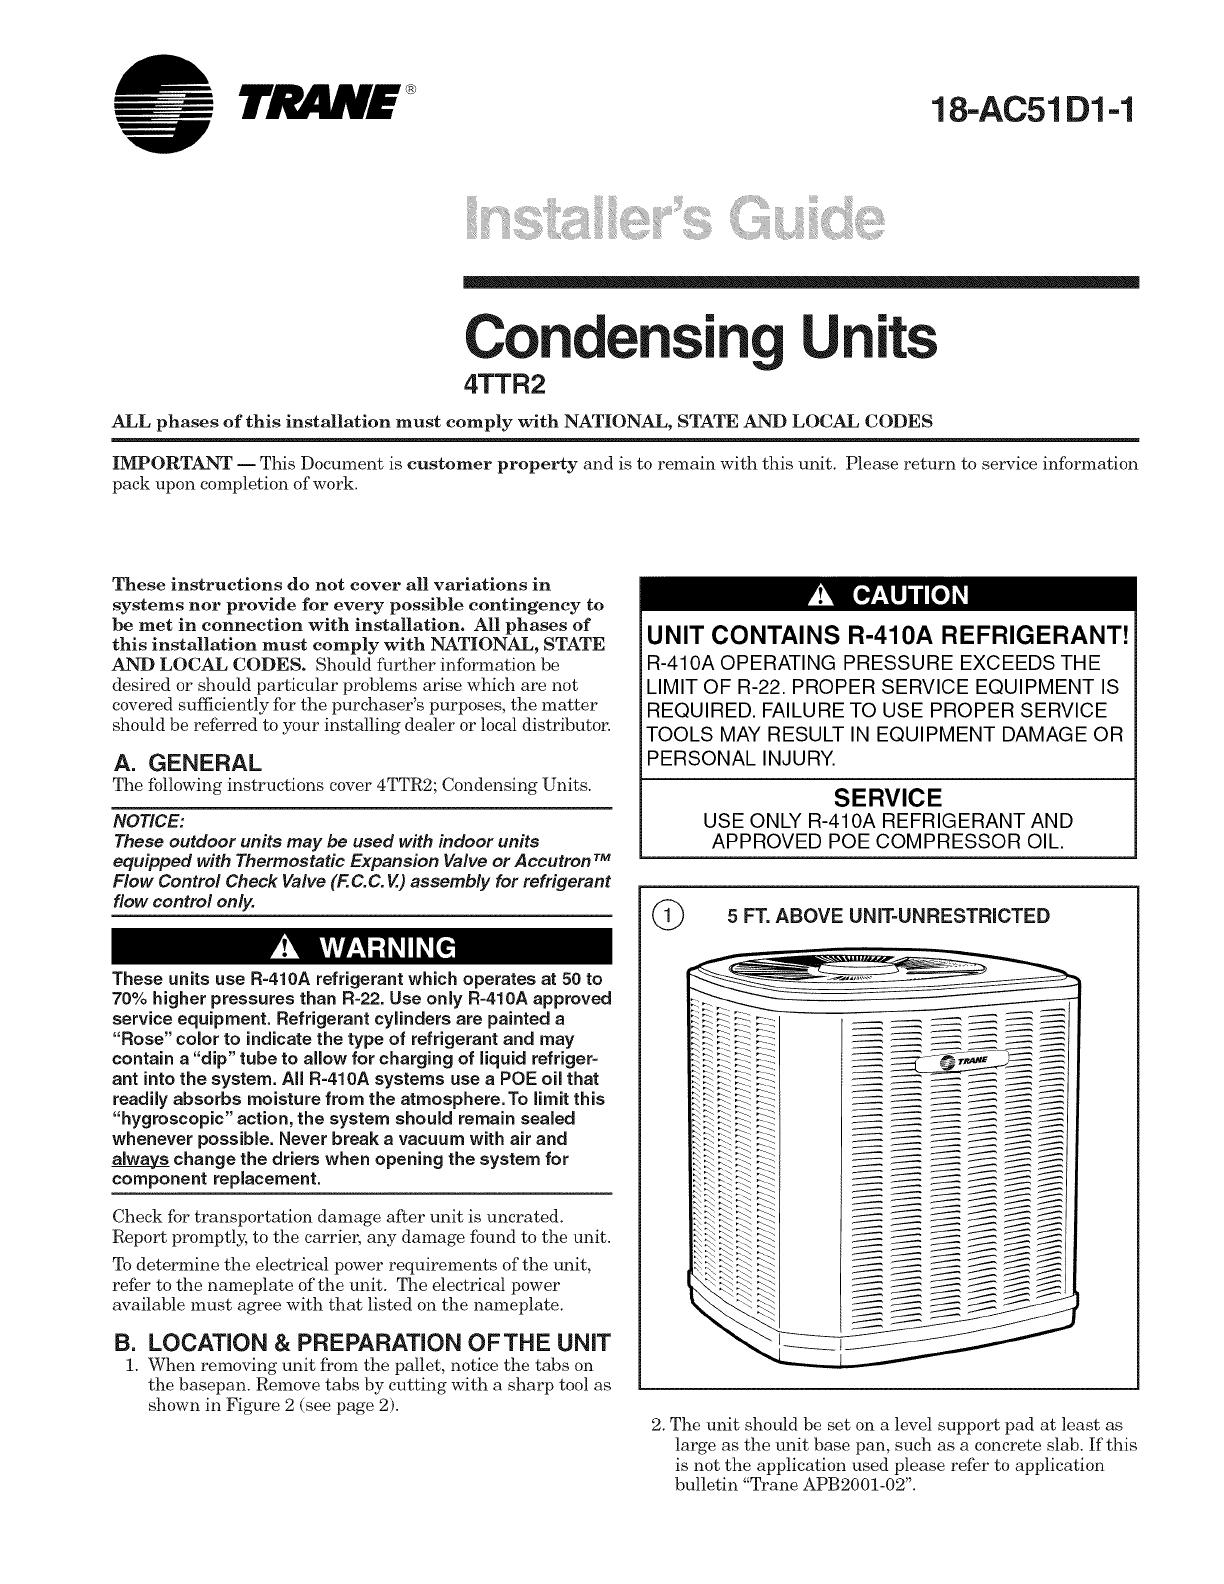 TRANE Air Conditioner/heat Pump(outside Unit) Manual L0905057